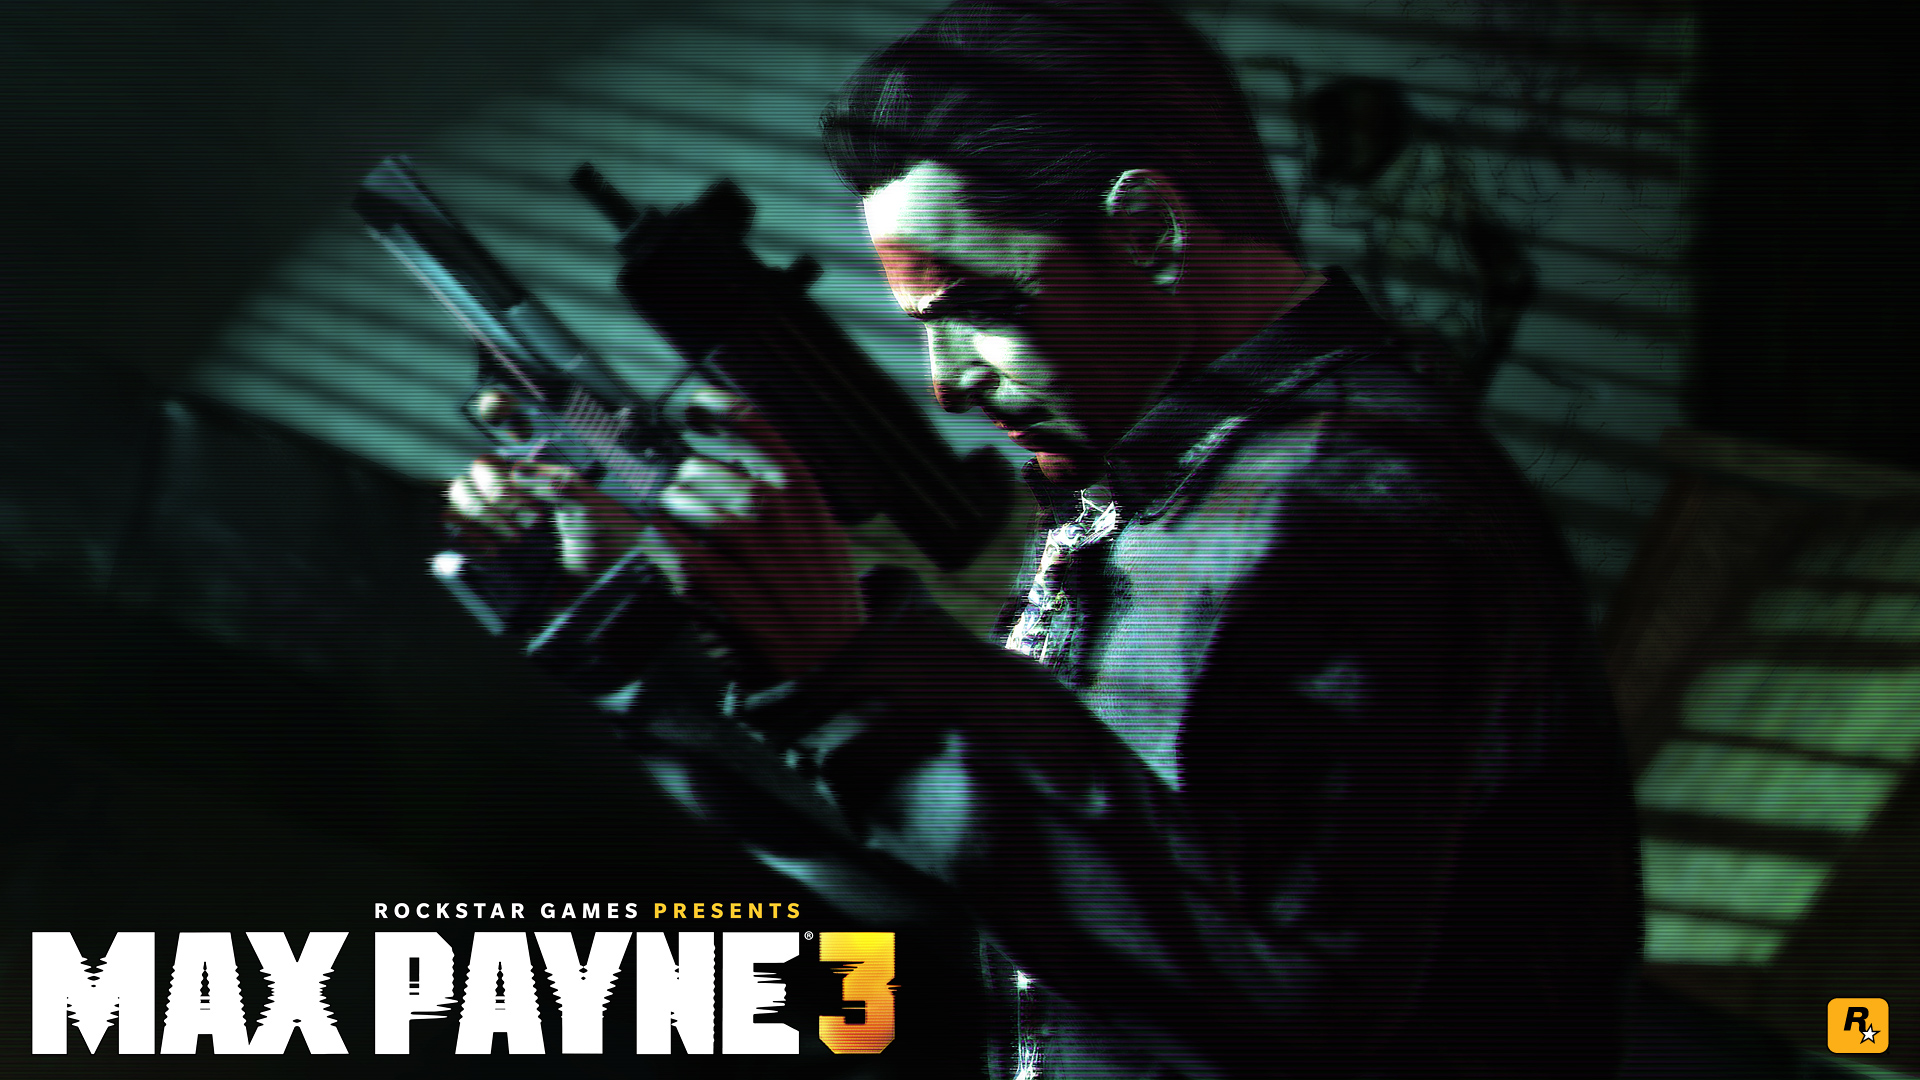 Max Payne 3 Wallpaper 1920x jpg 275134 1920x1080